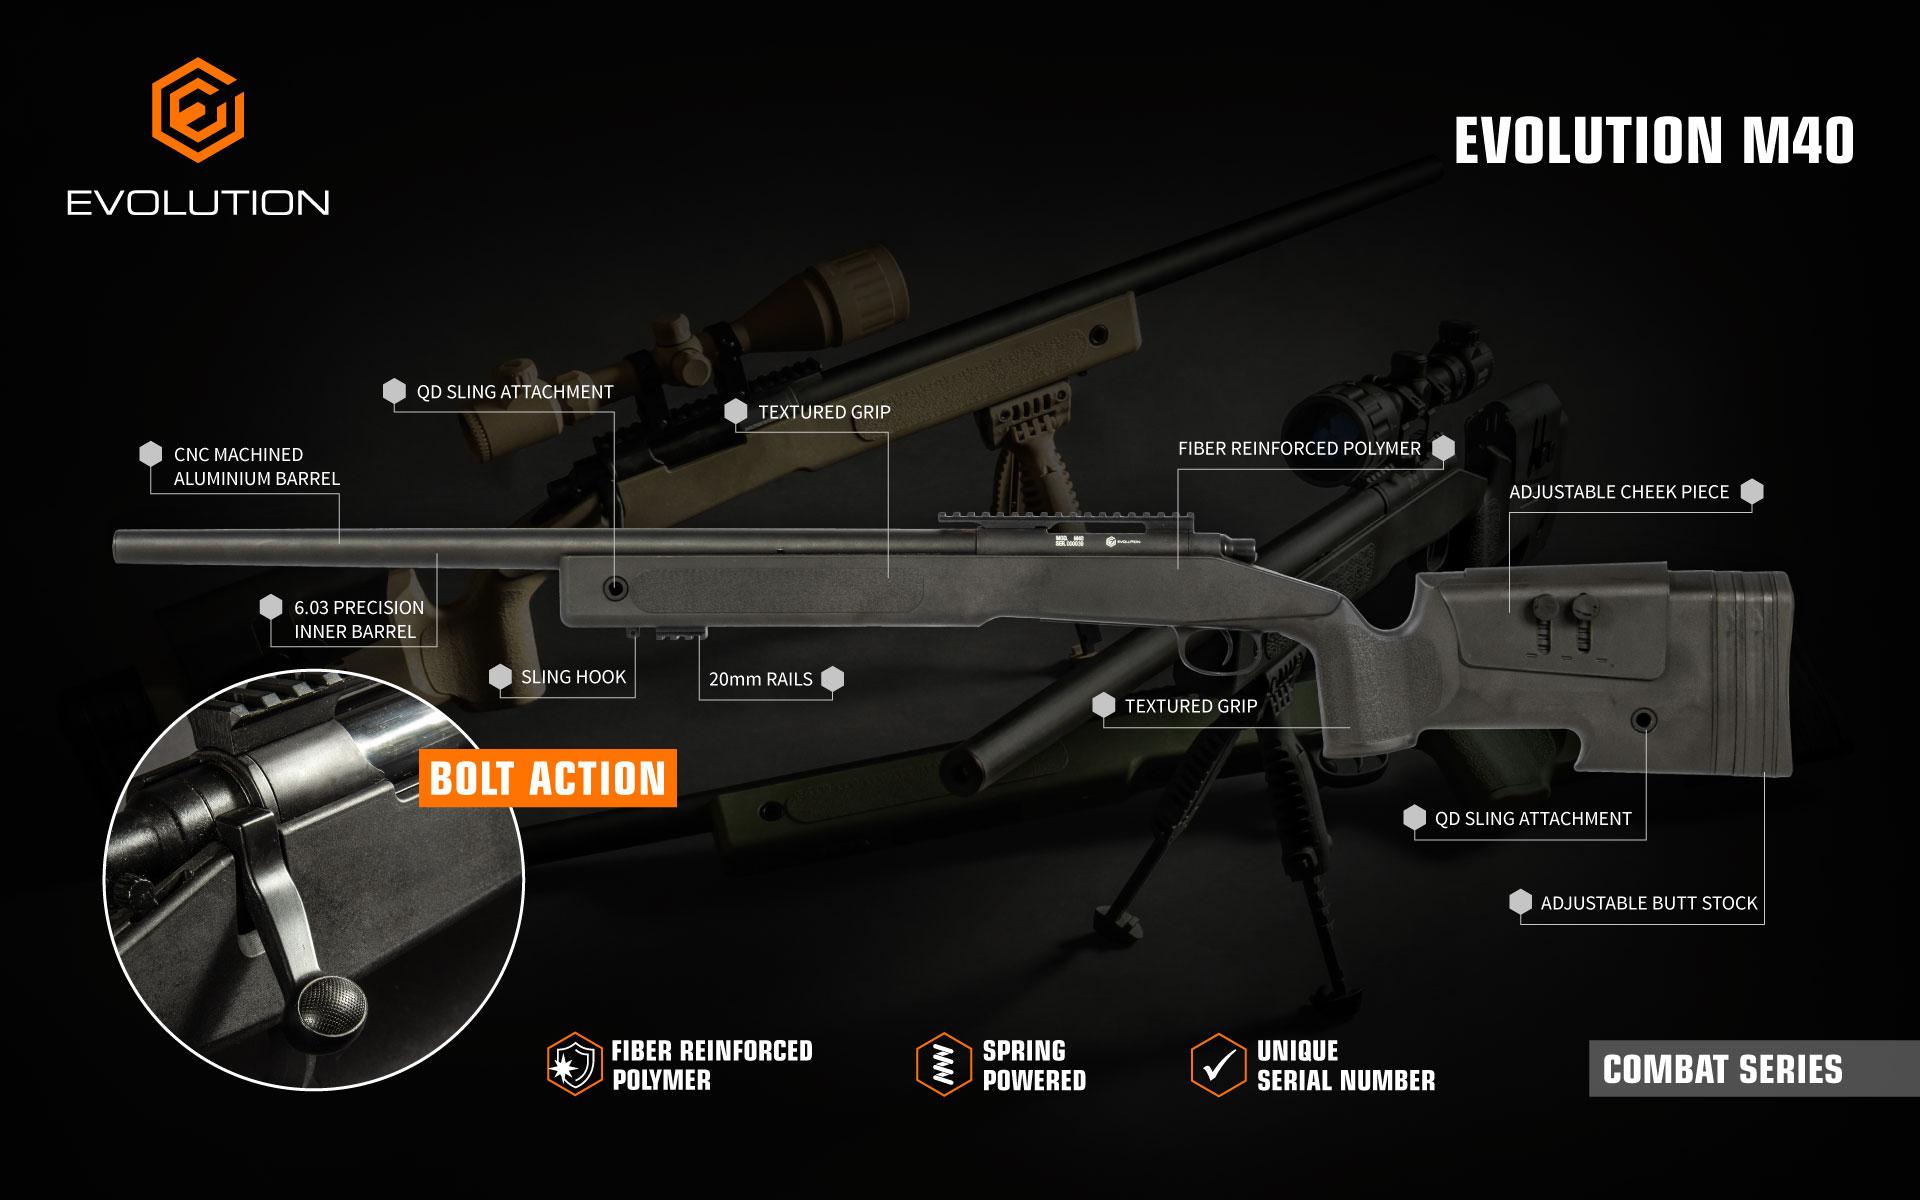 Evolution Combat Series M40 air soft gun